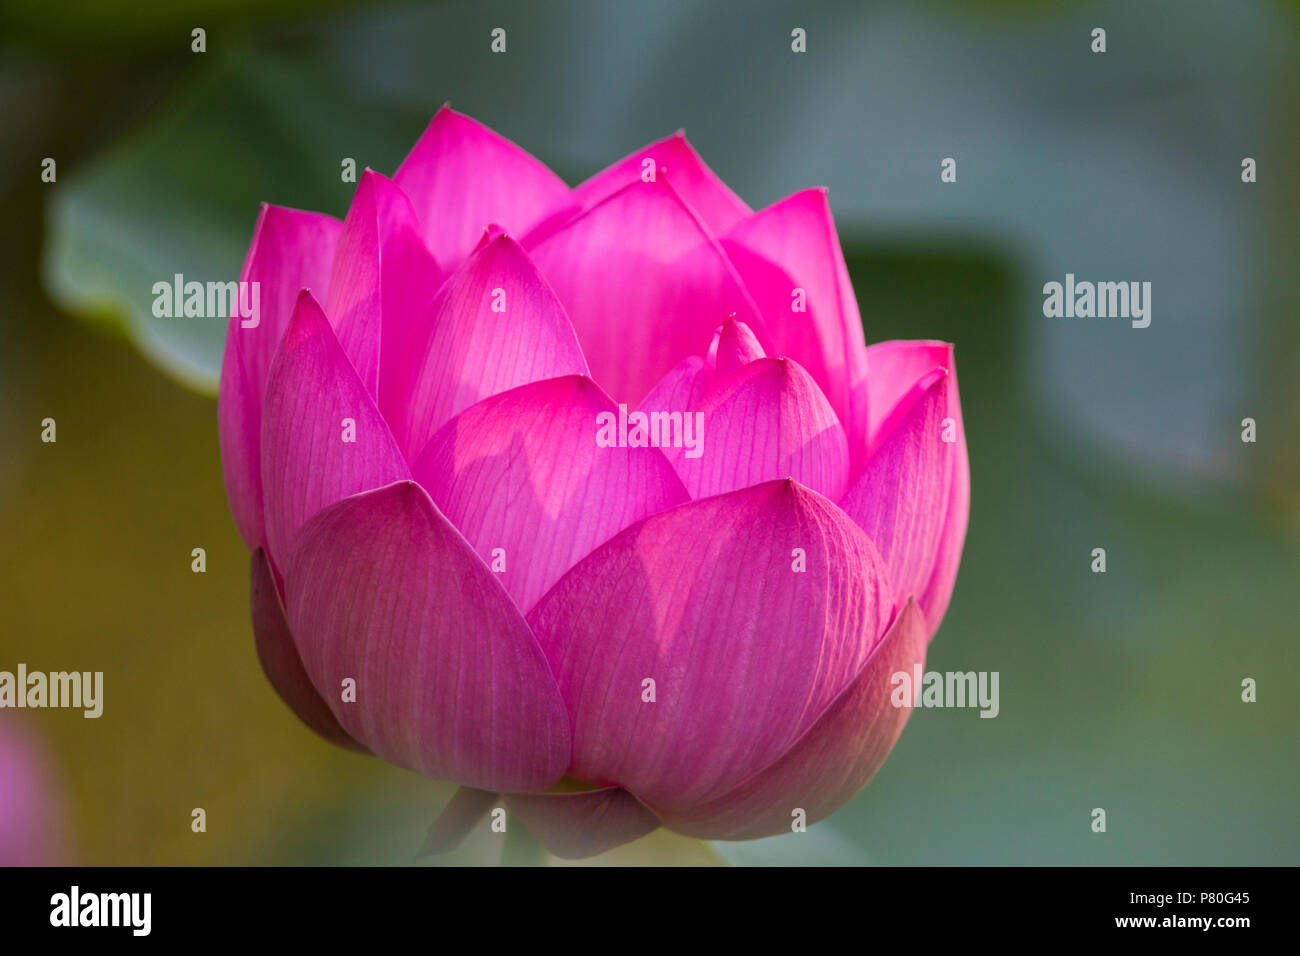 Indian lotus flower nelumbo nucifera stock photo 211454325 alamy indian lotus flower nelumbo nucifera mightylinksfo